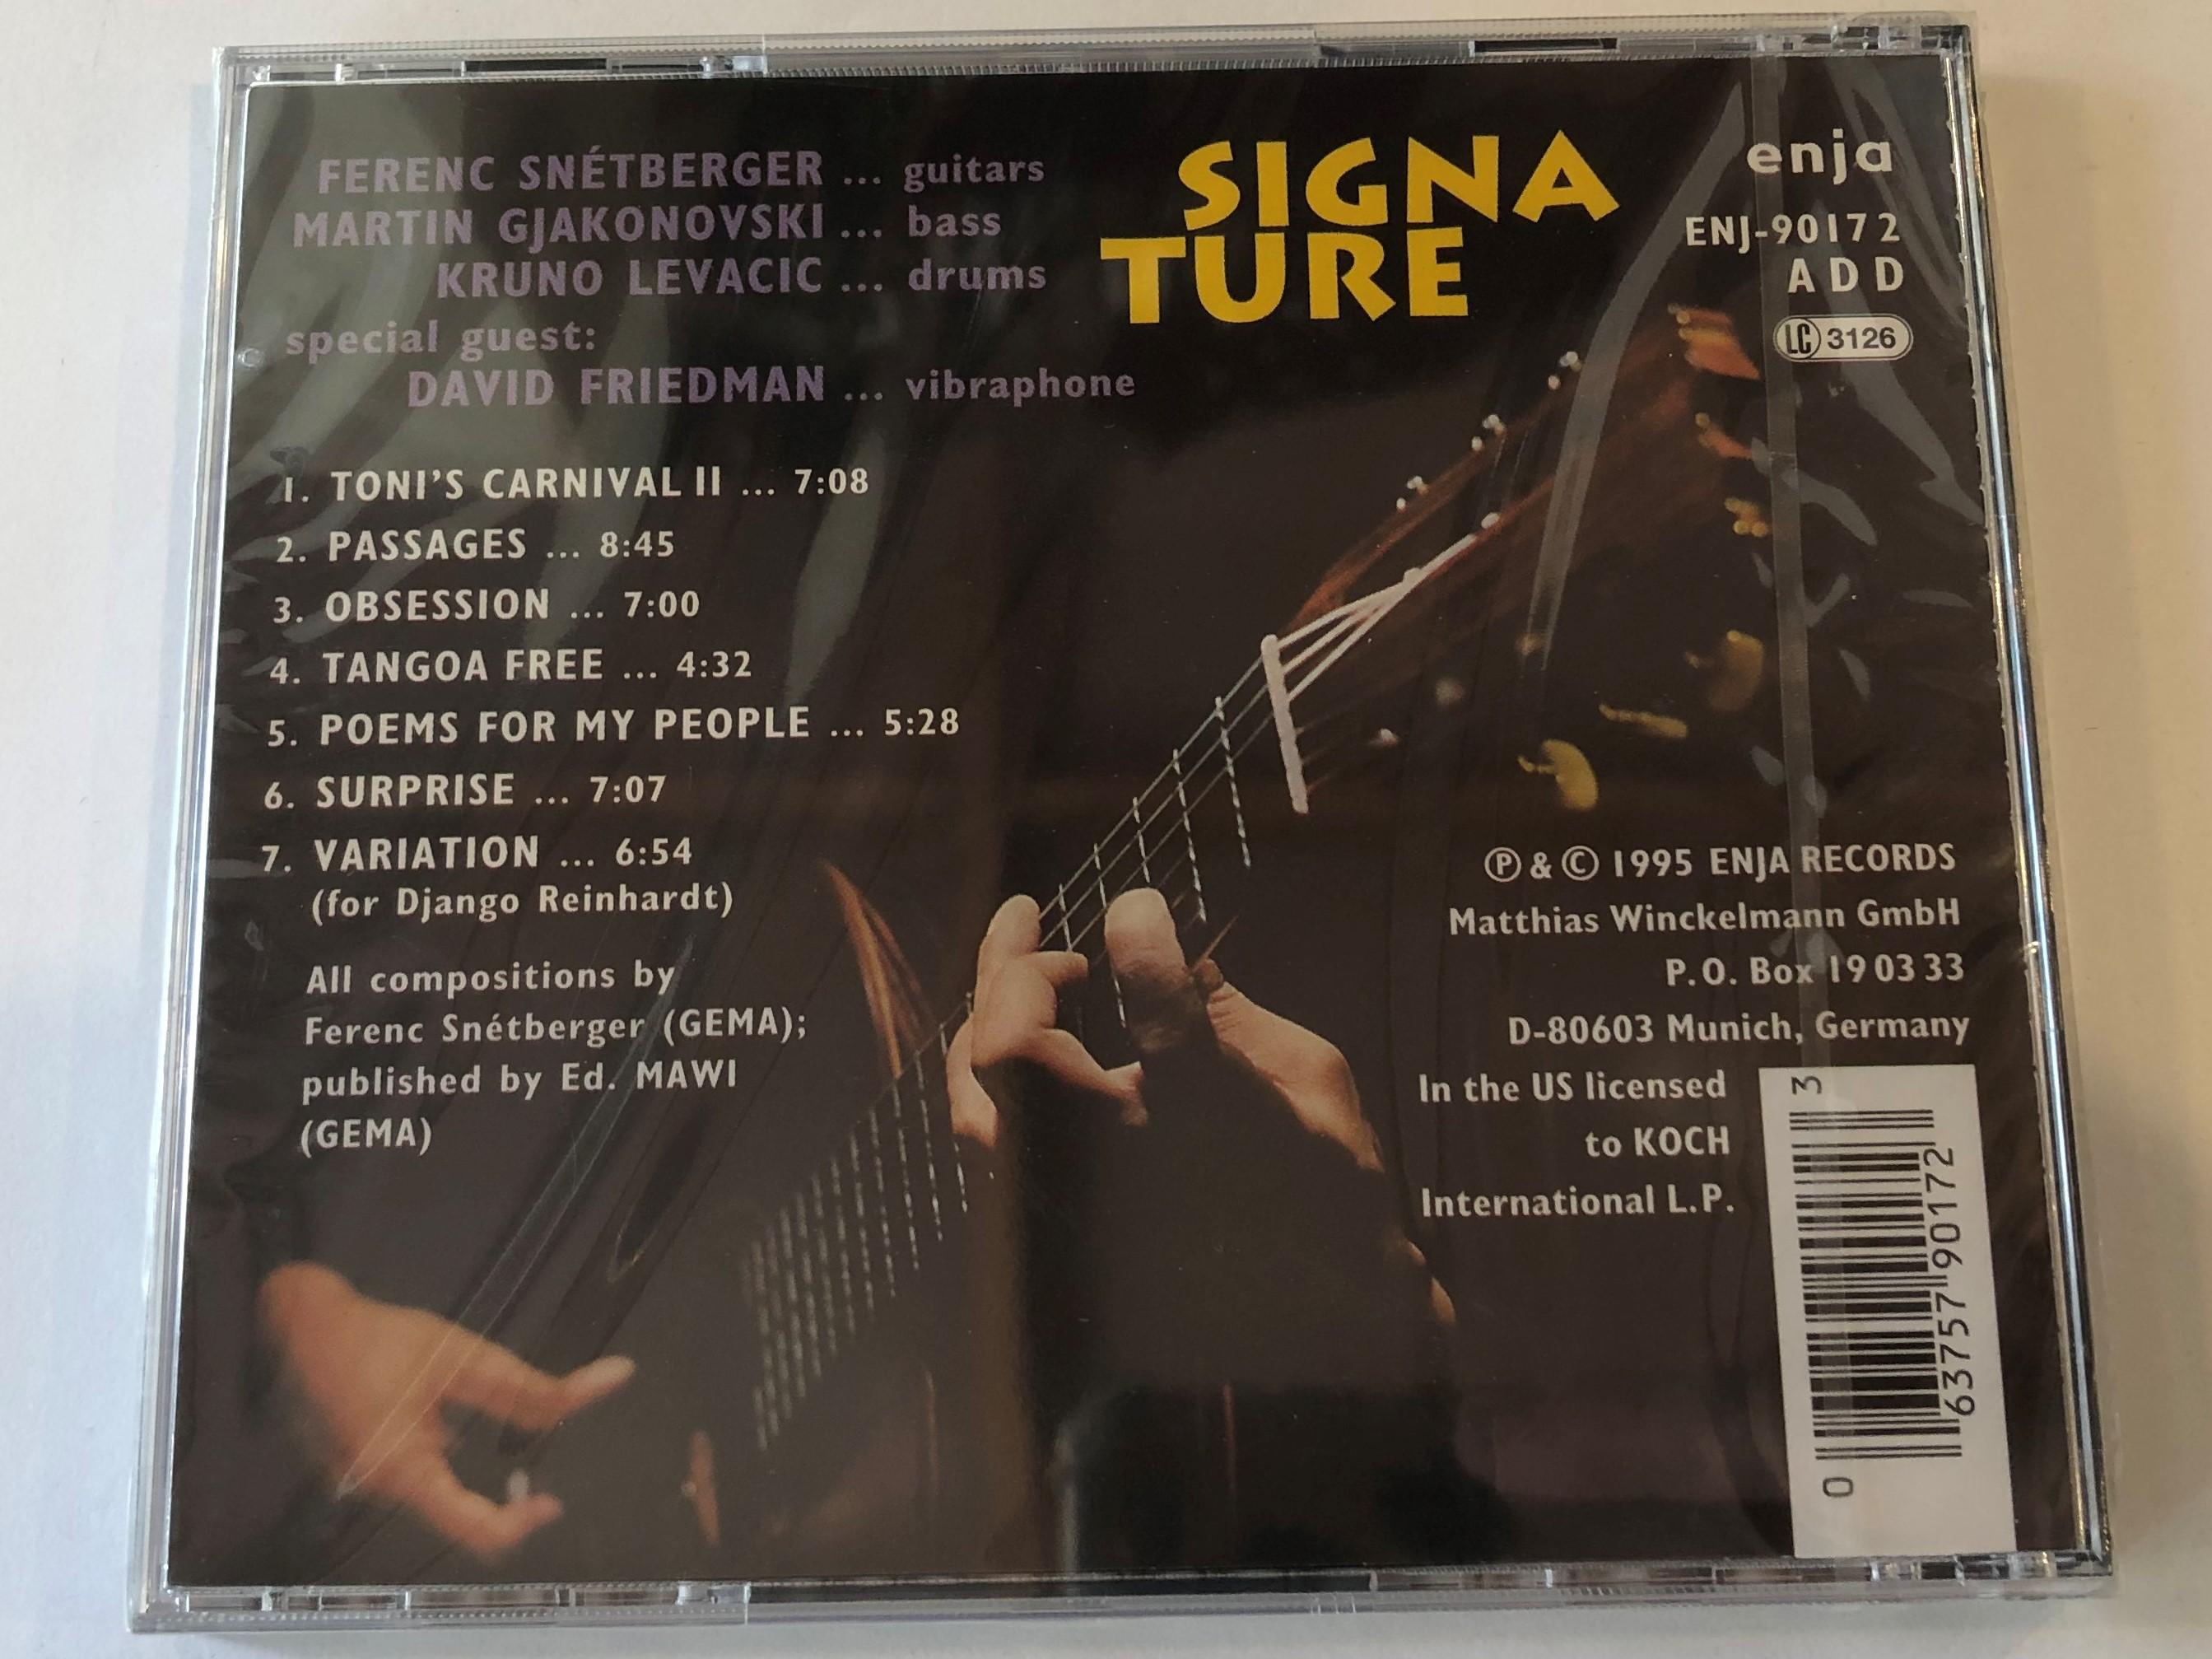 ferenc-sn-tberger-trio-with-david-friedman-signa-ture-enja-records-audio-cd-1995-enj-90172-2-.jpg